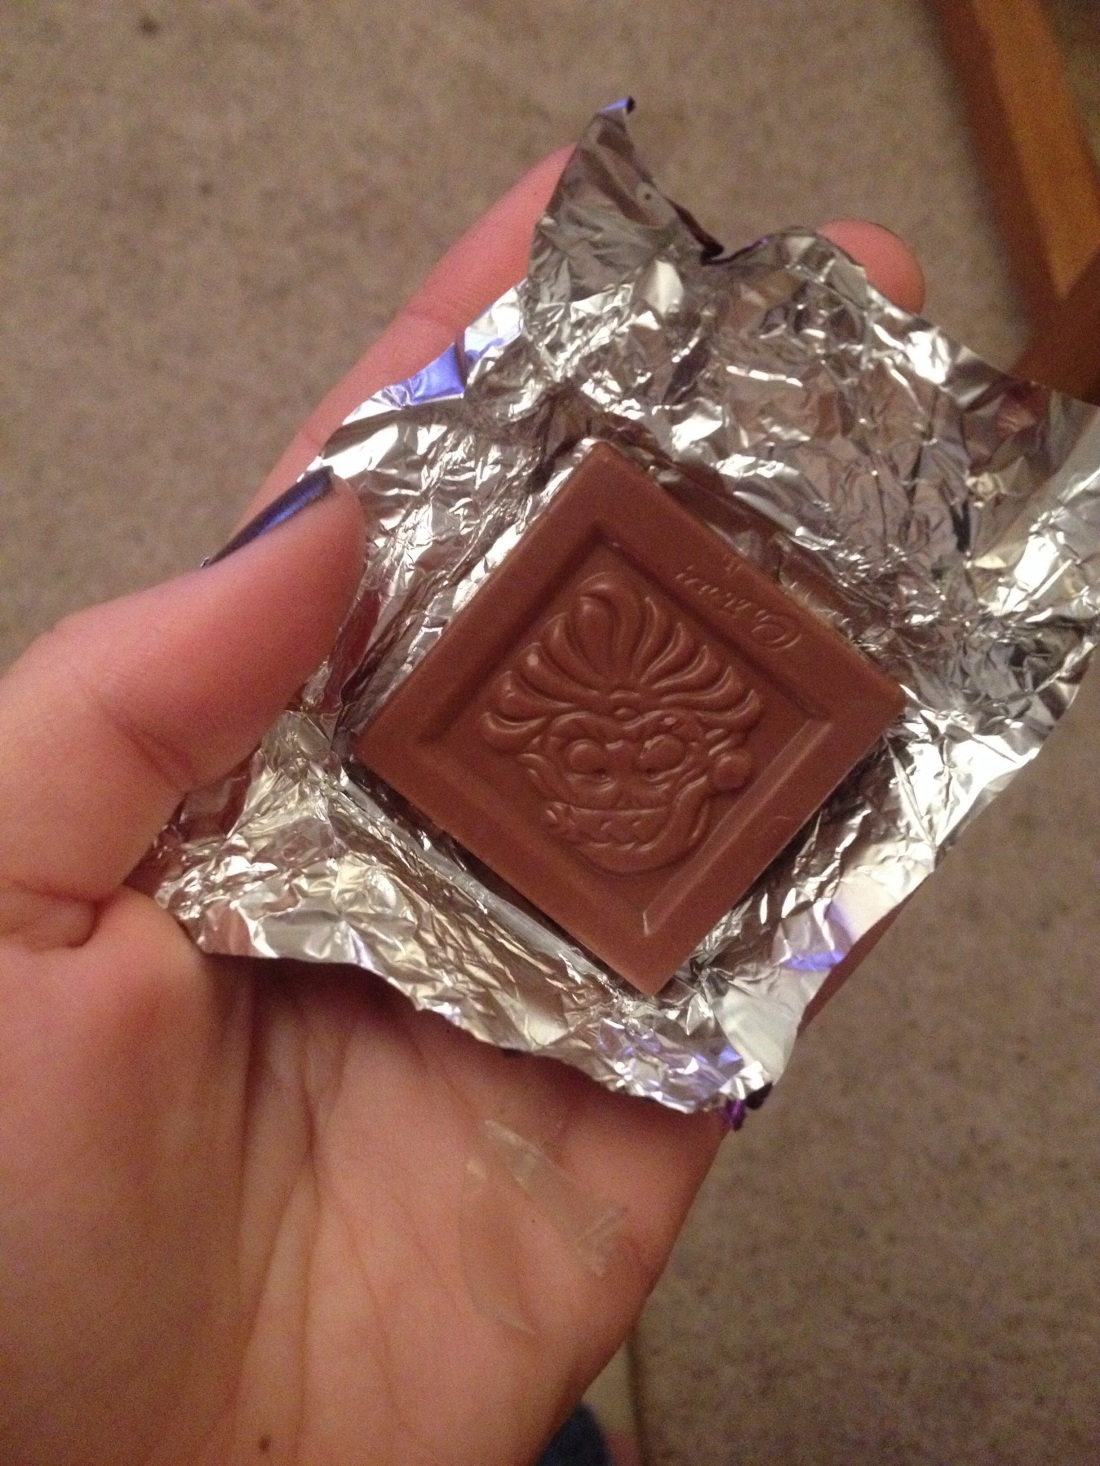 Scary Chocolate